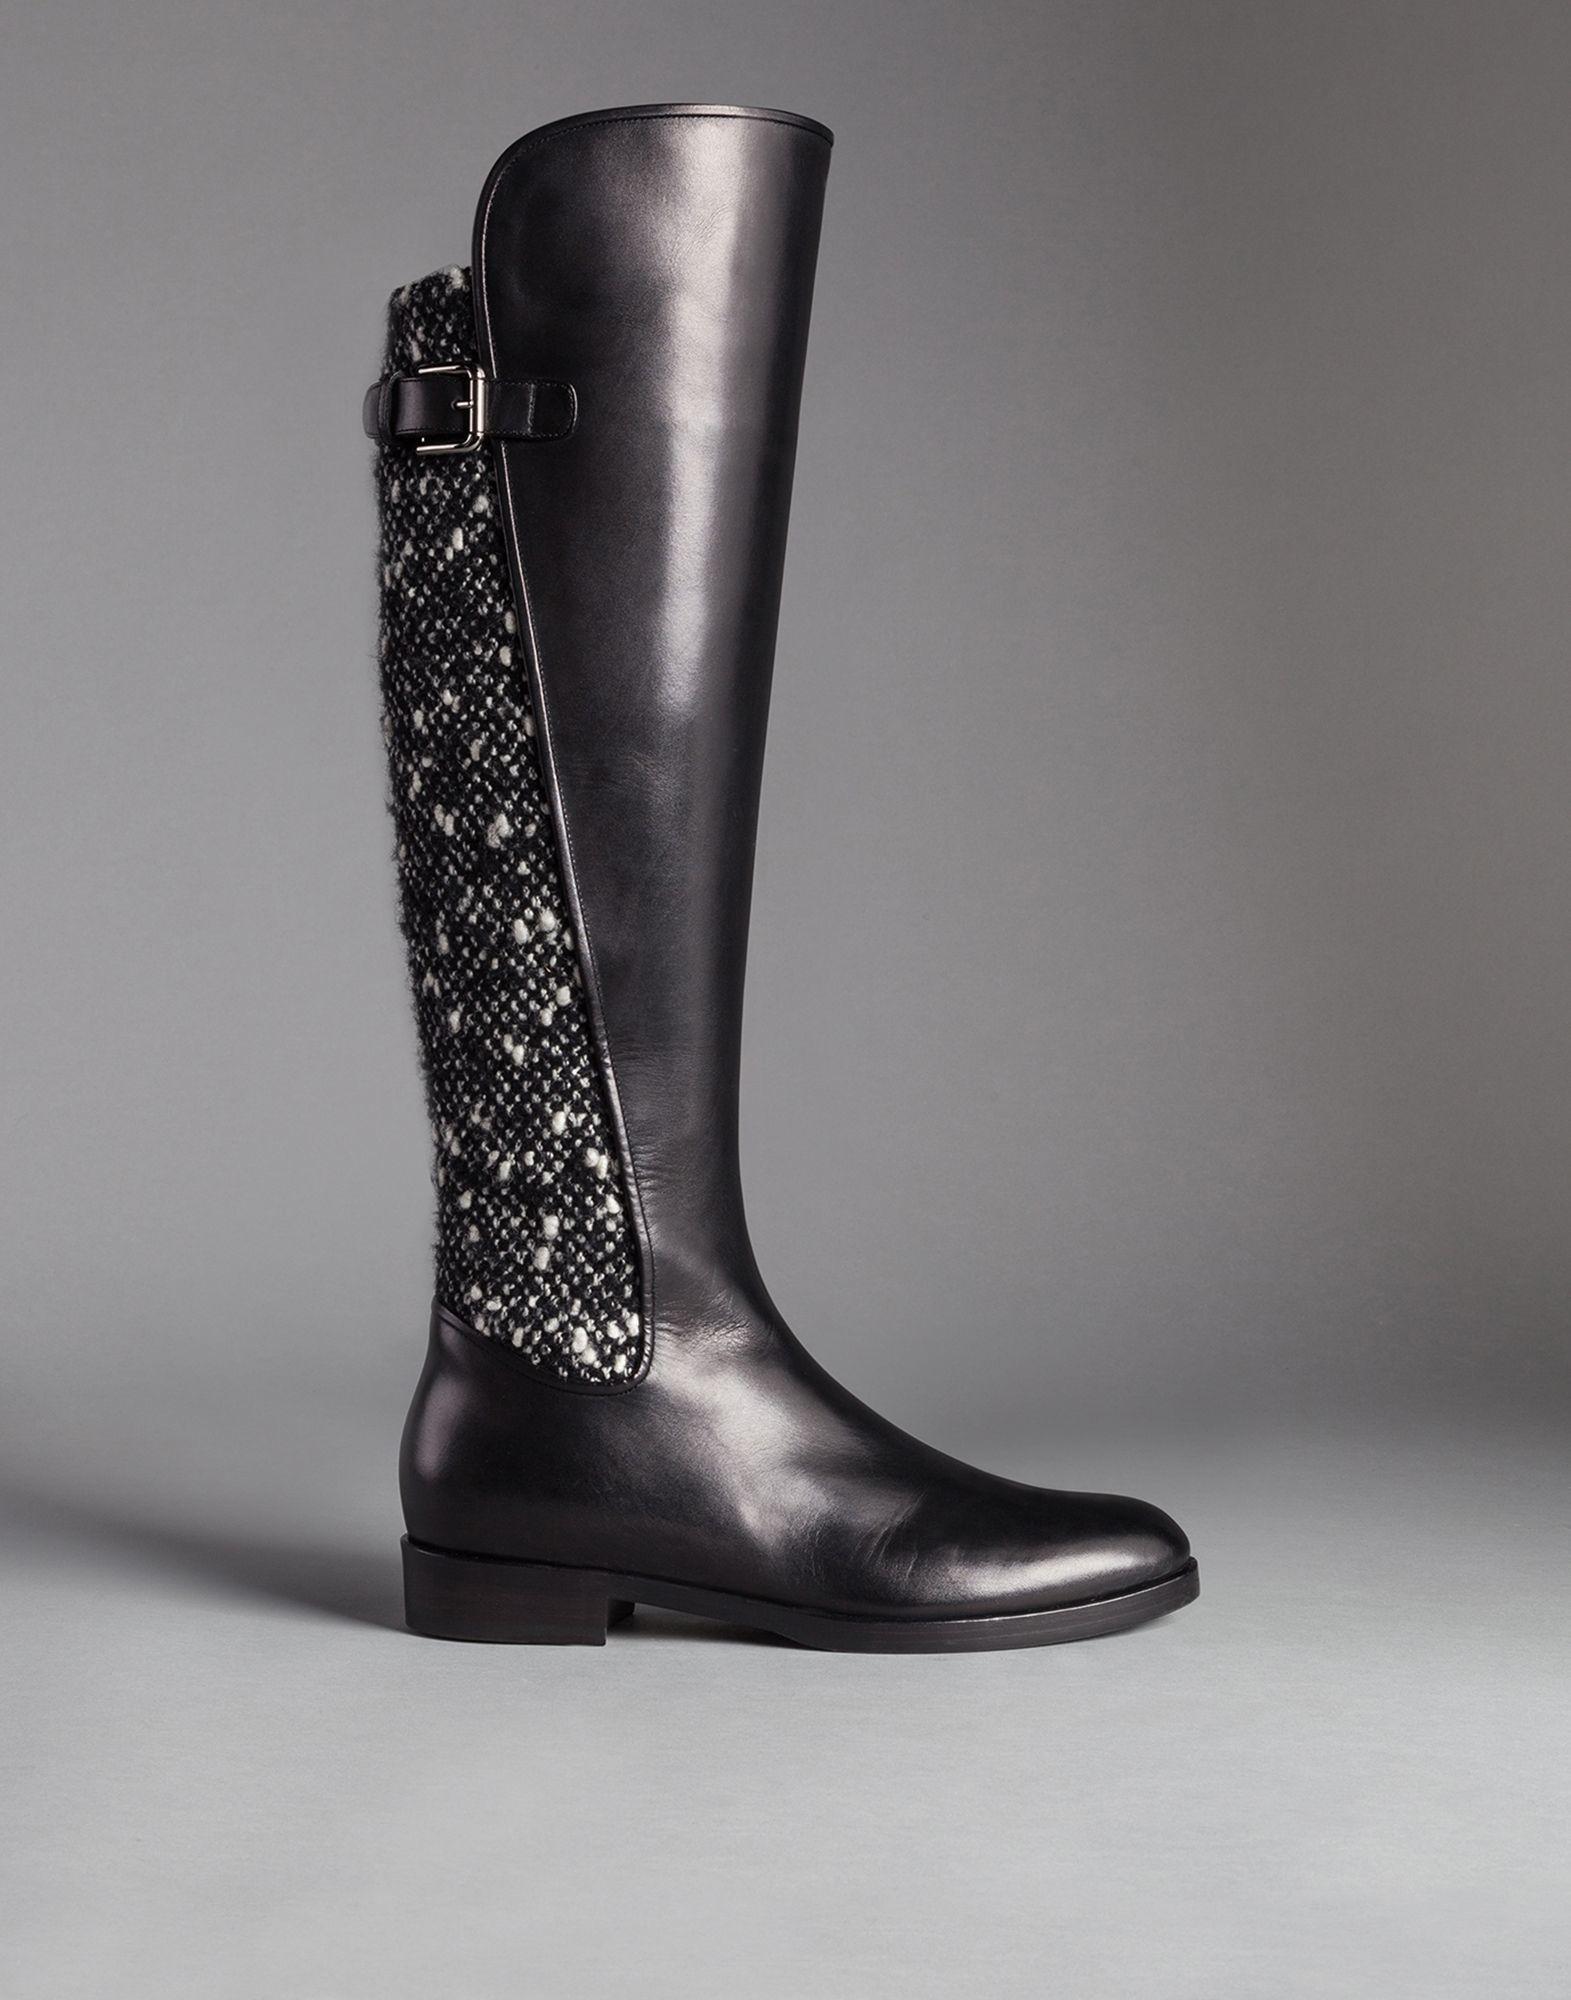 Dolce & Gabbana Boots calfskin bordeaux 4FxfDVdWA